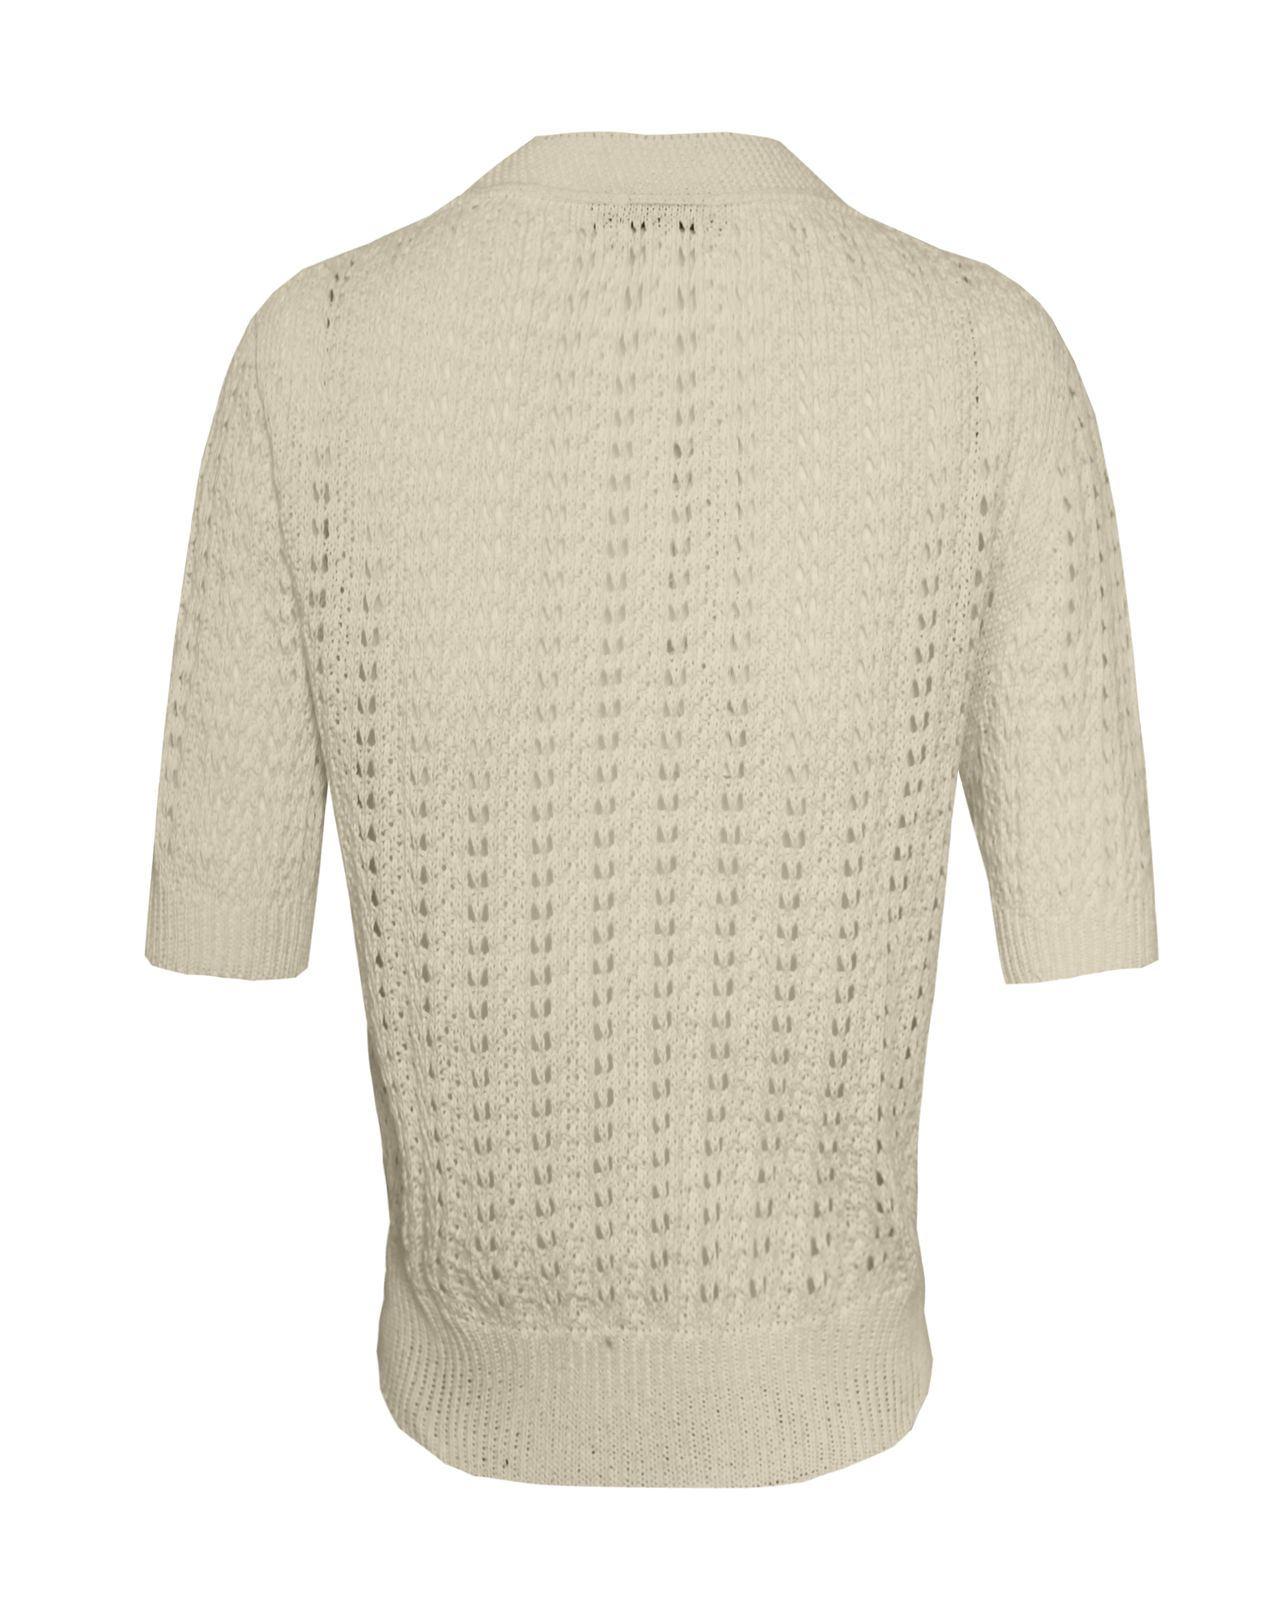 Mesdames-crochet-tricote-pour-femme-manches-courtes-hausser-brooched-cardigan-crop-top-8-14 miniature 17